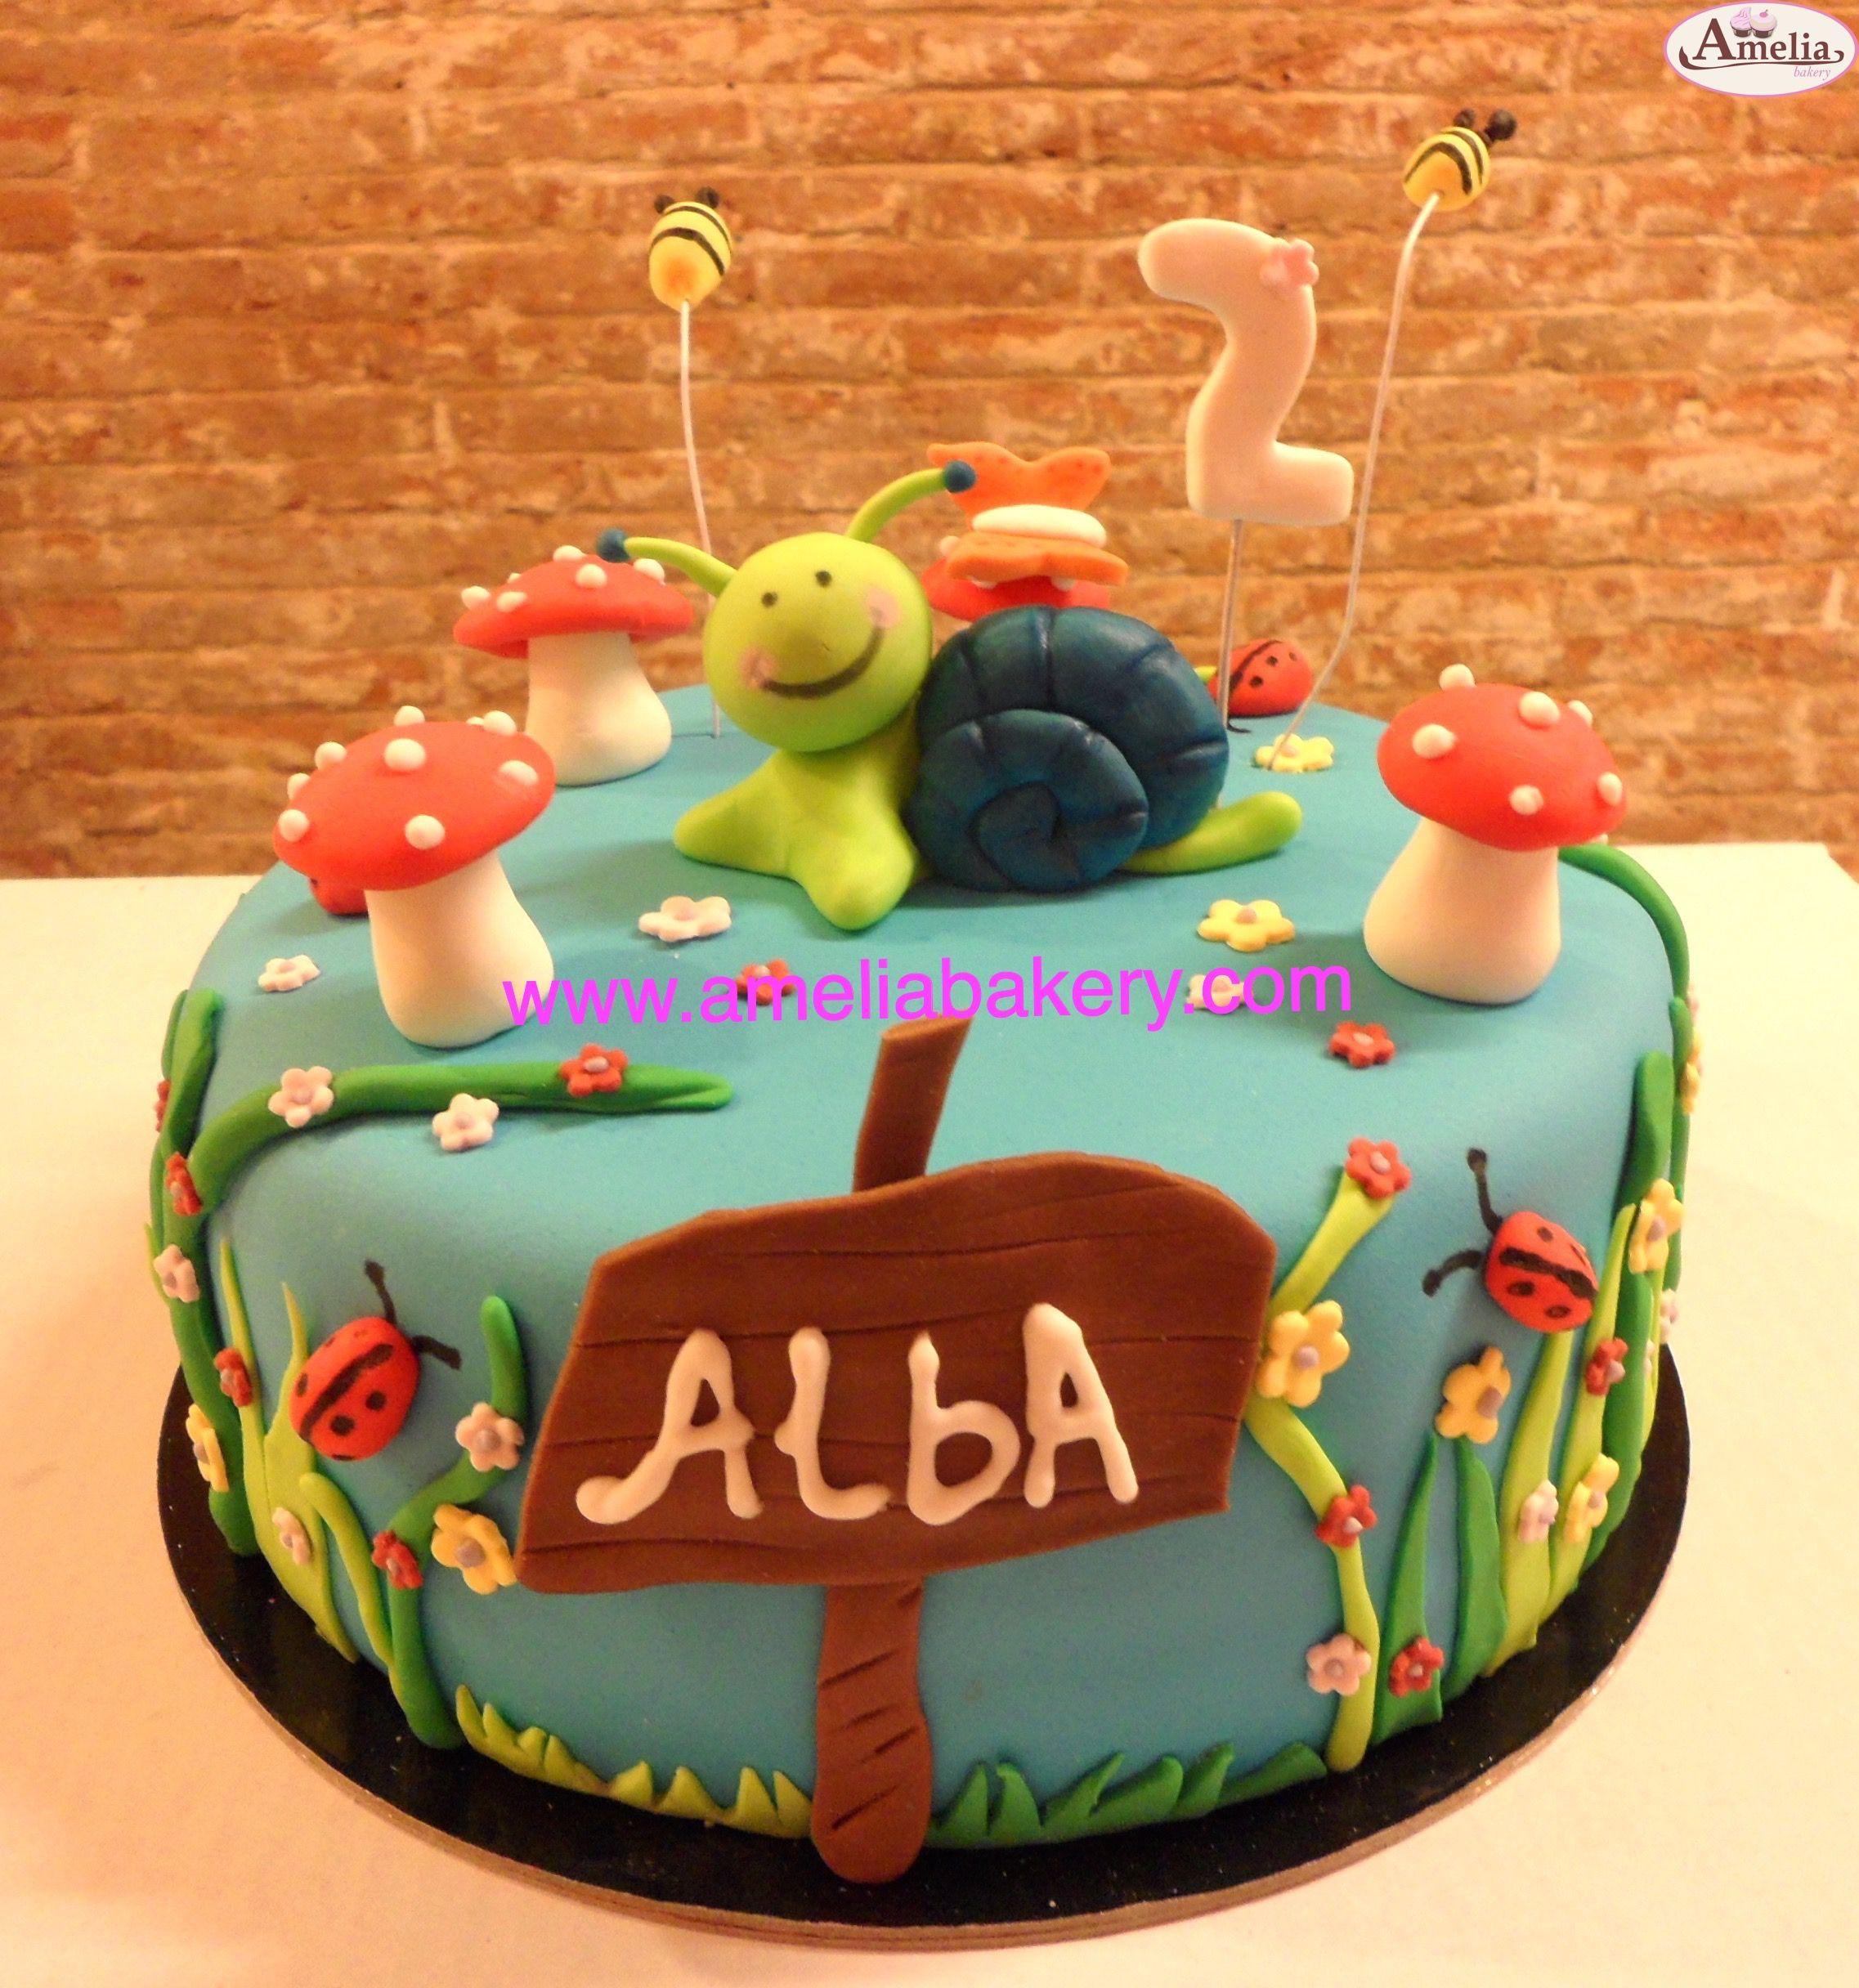 tartas tartasfondant fondant personalizadas pasteles